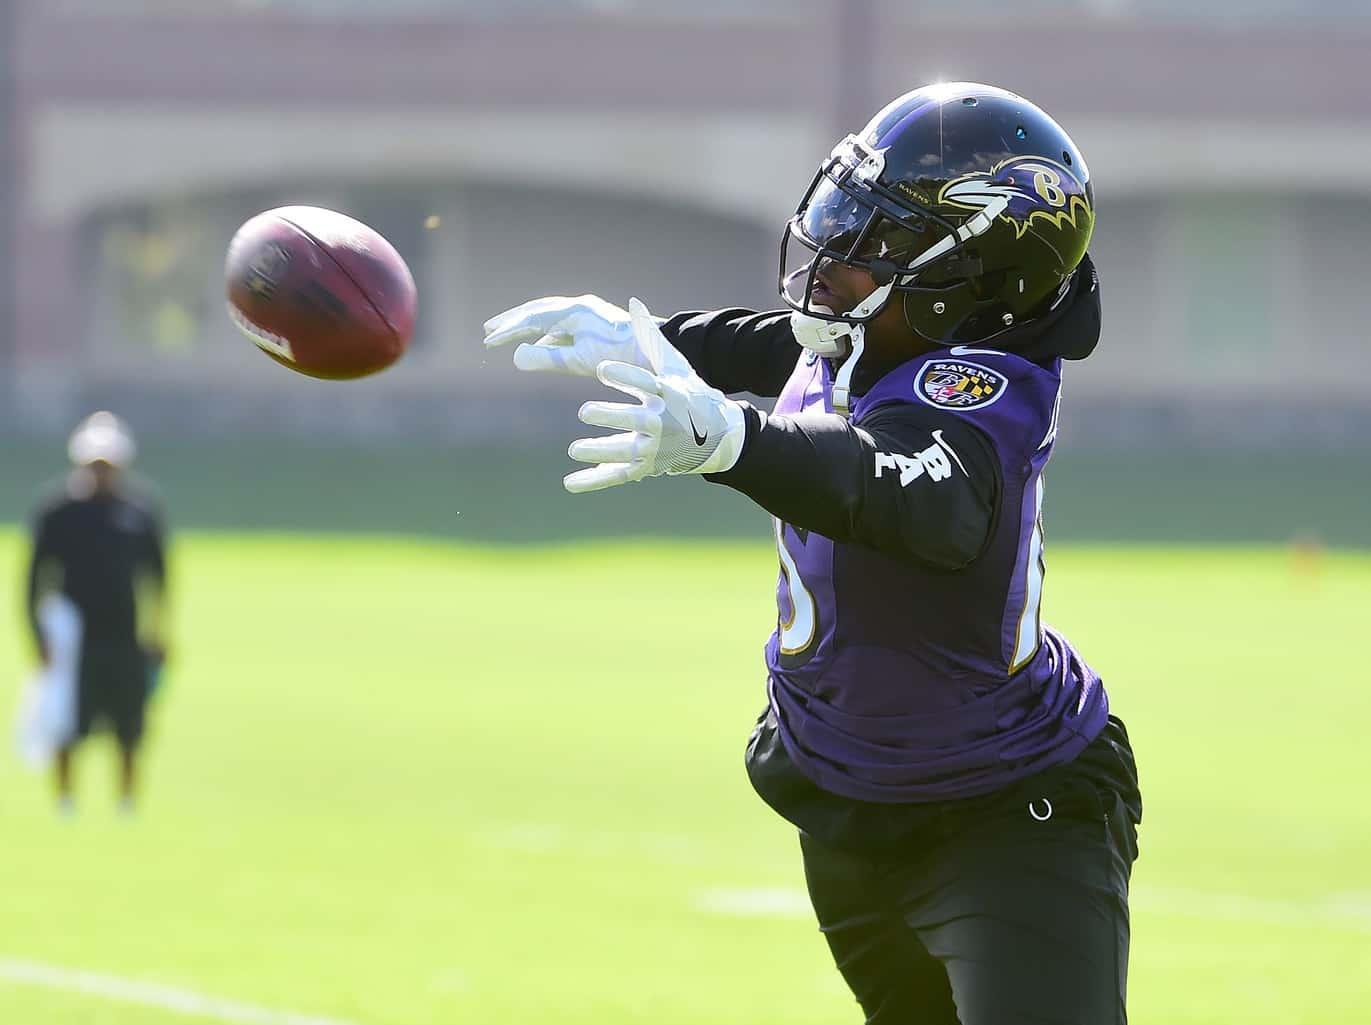 Ravens receiver Michael Crabtree